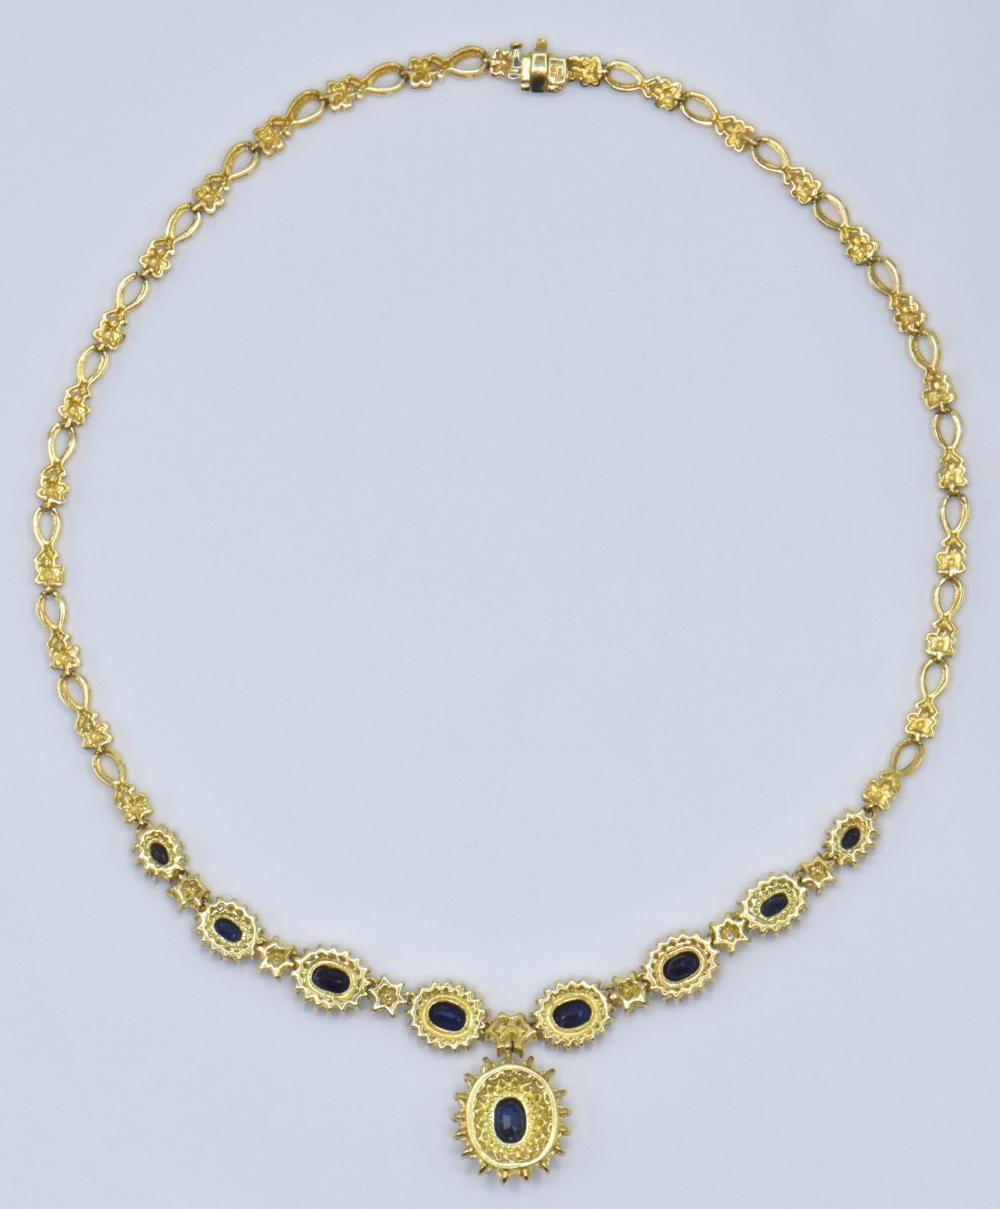 18 Karat Yellow Gold, Diamond, & Sapphire Necklace